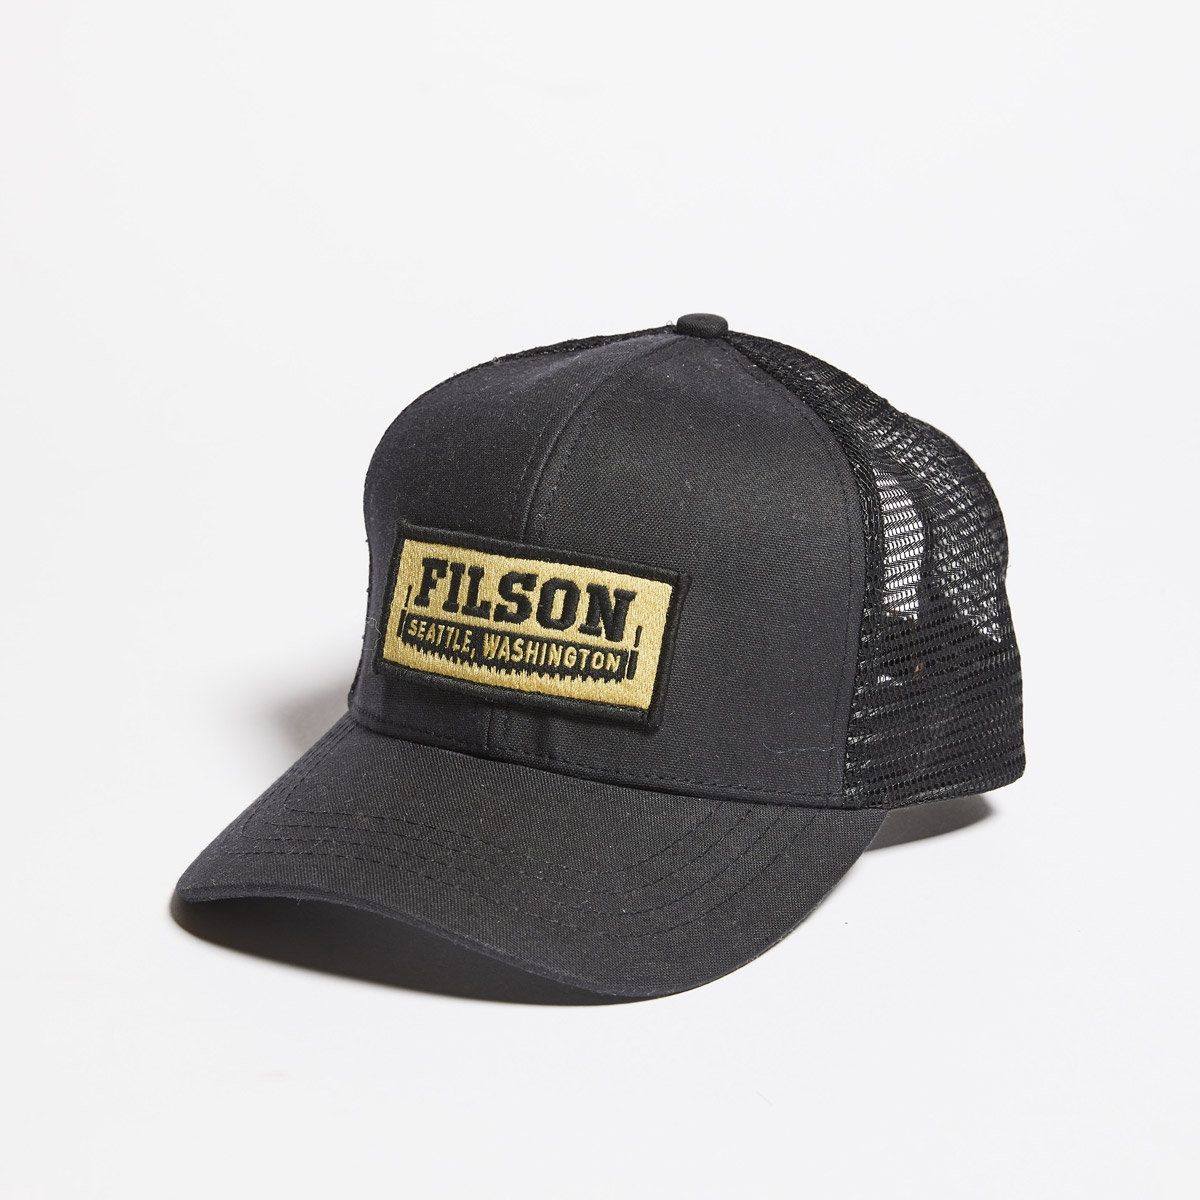 Filson Mesh Logger Cap-Black, Robustes 6 Panel Logger Cap mit Mesh Panels für optimale Belüftung